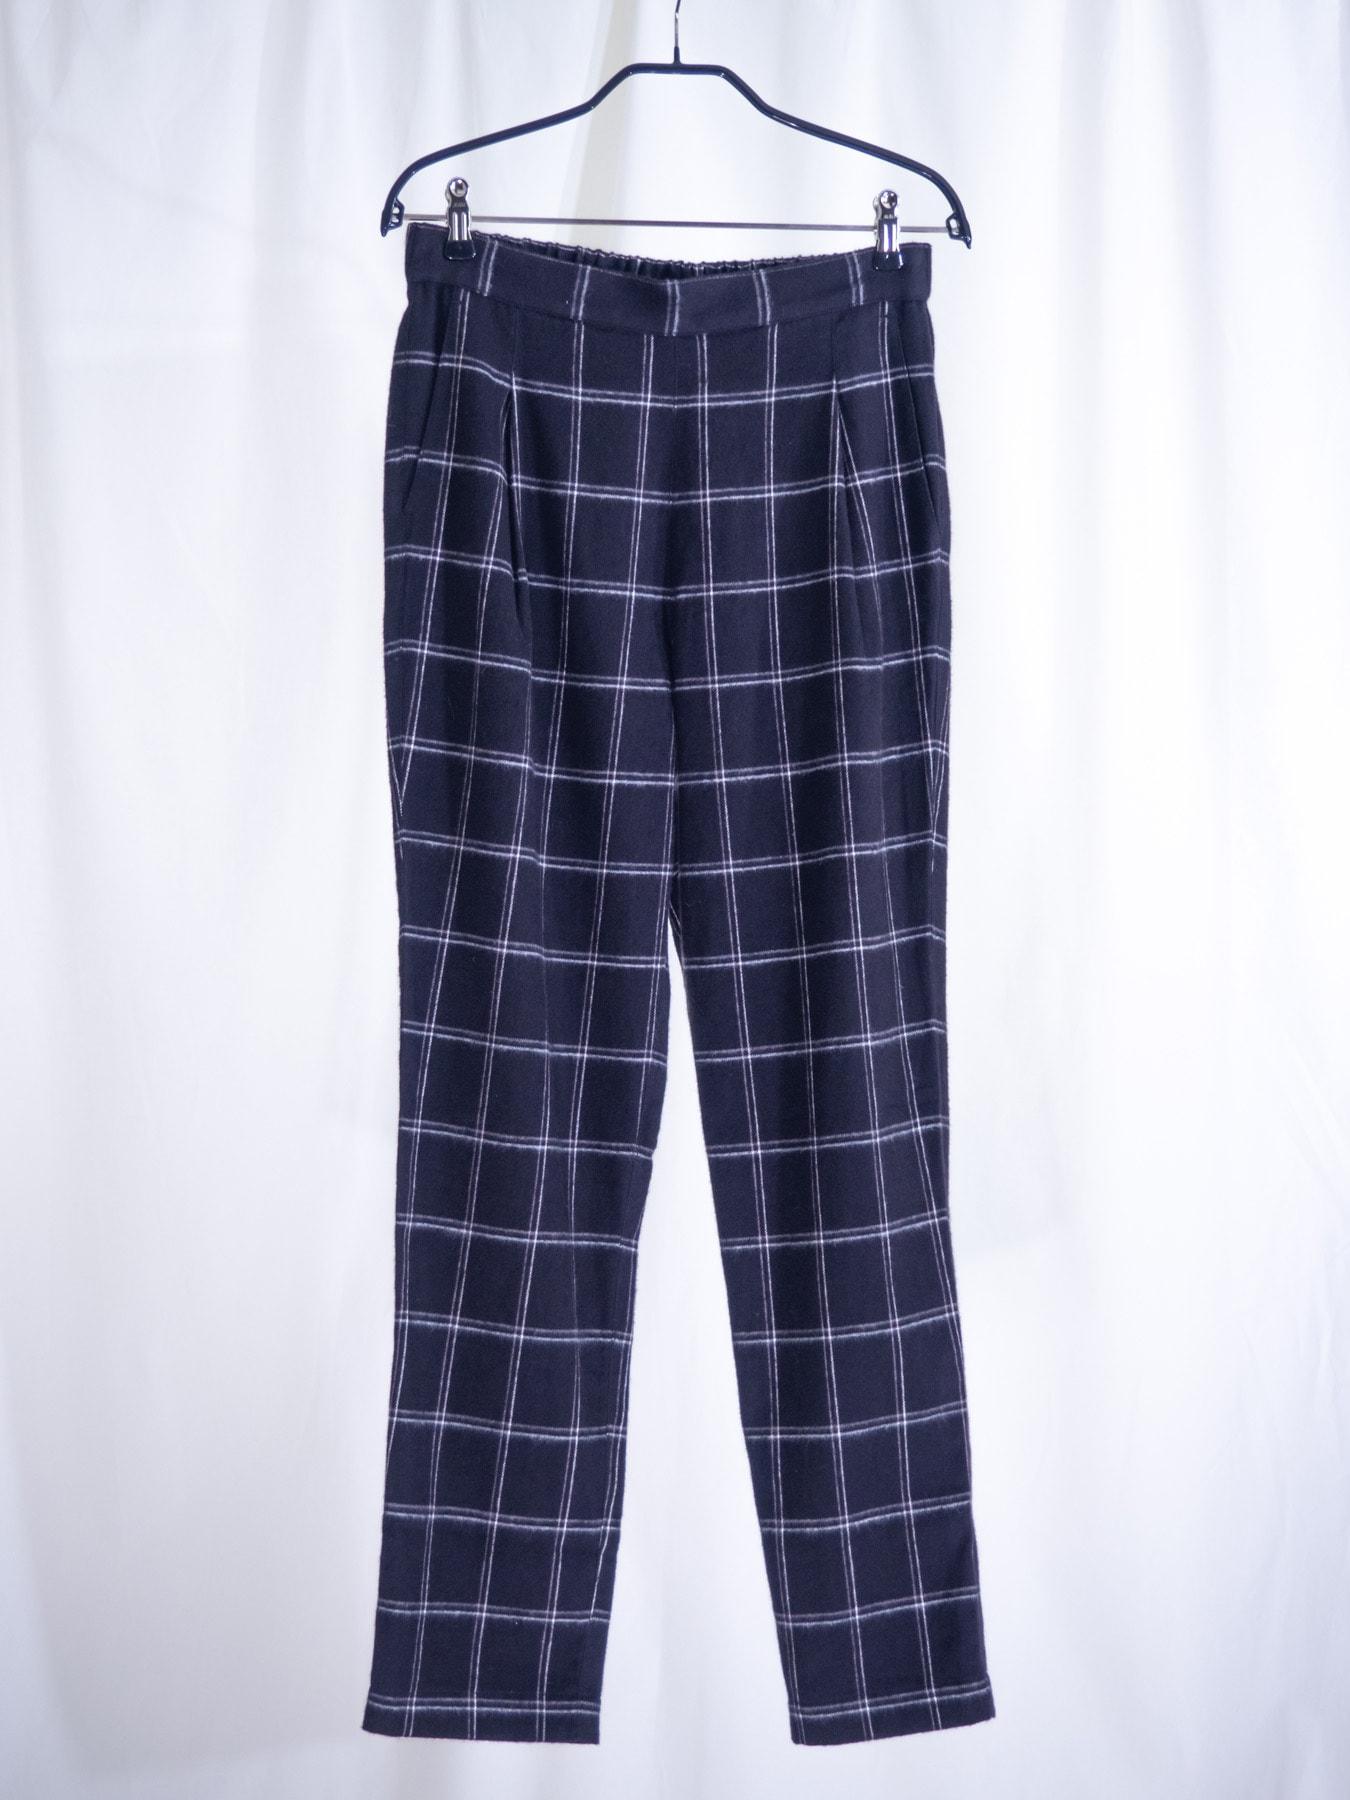 Reiko check trousers